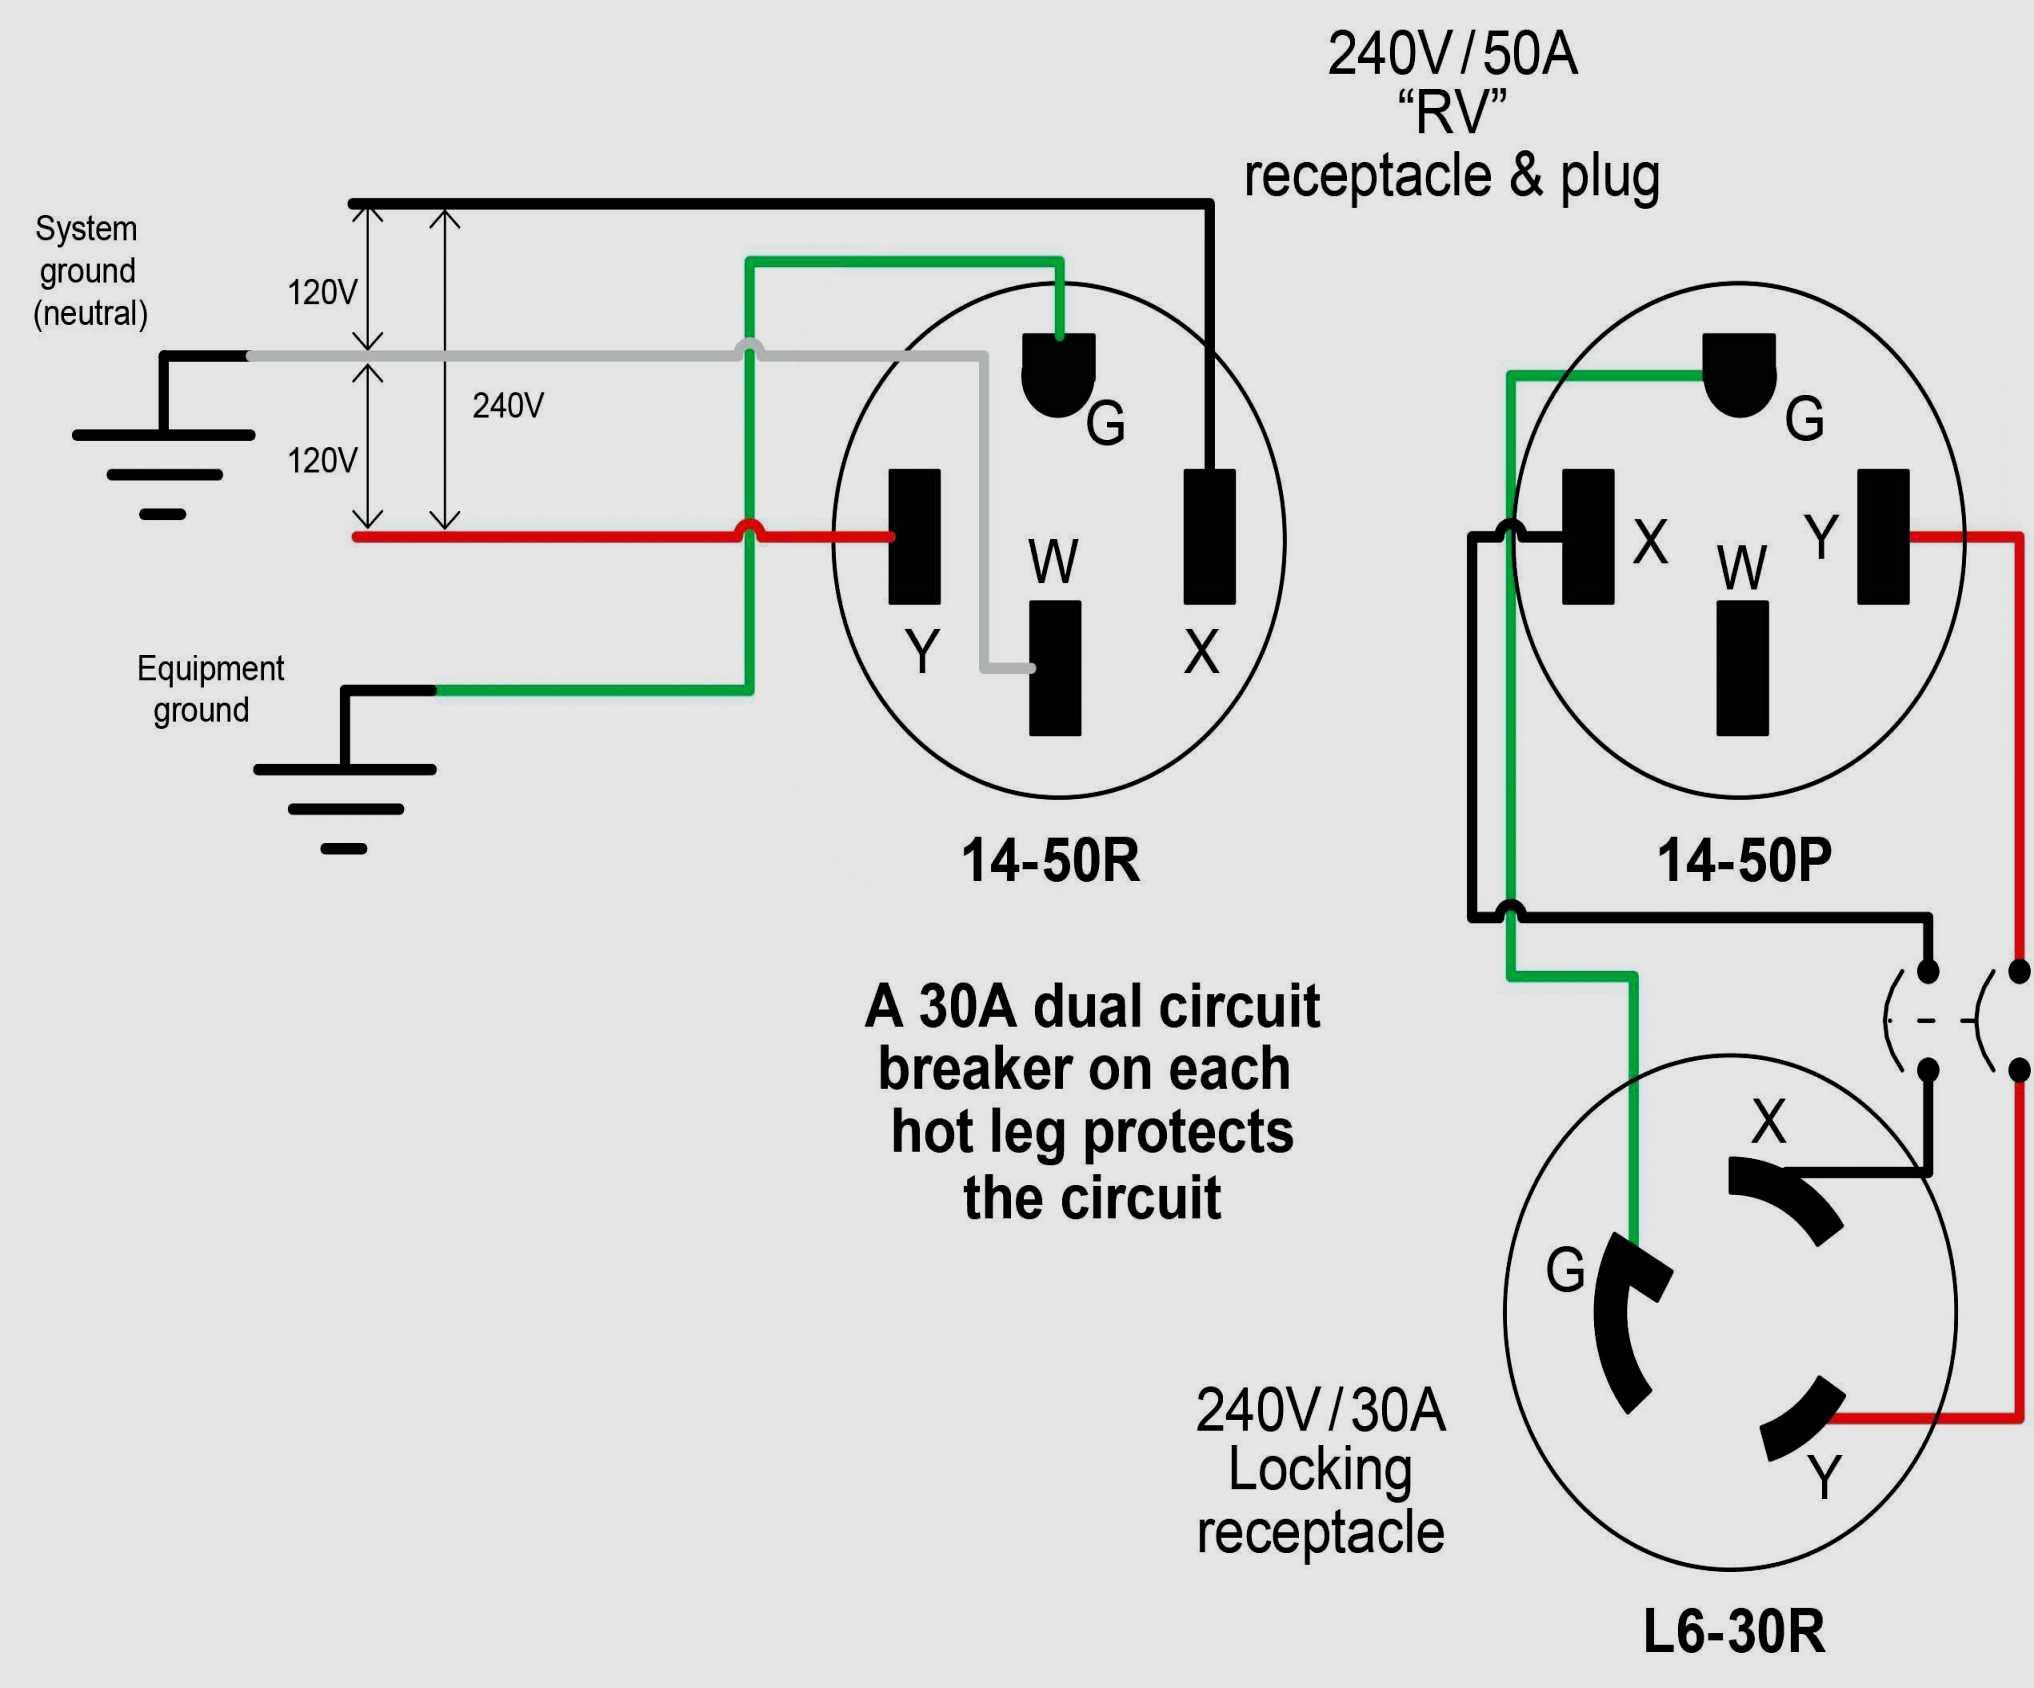 3 Phase Plug Wiring Diagram - Wiring Diagrams Hubs - Receptacle Wiring Diagram